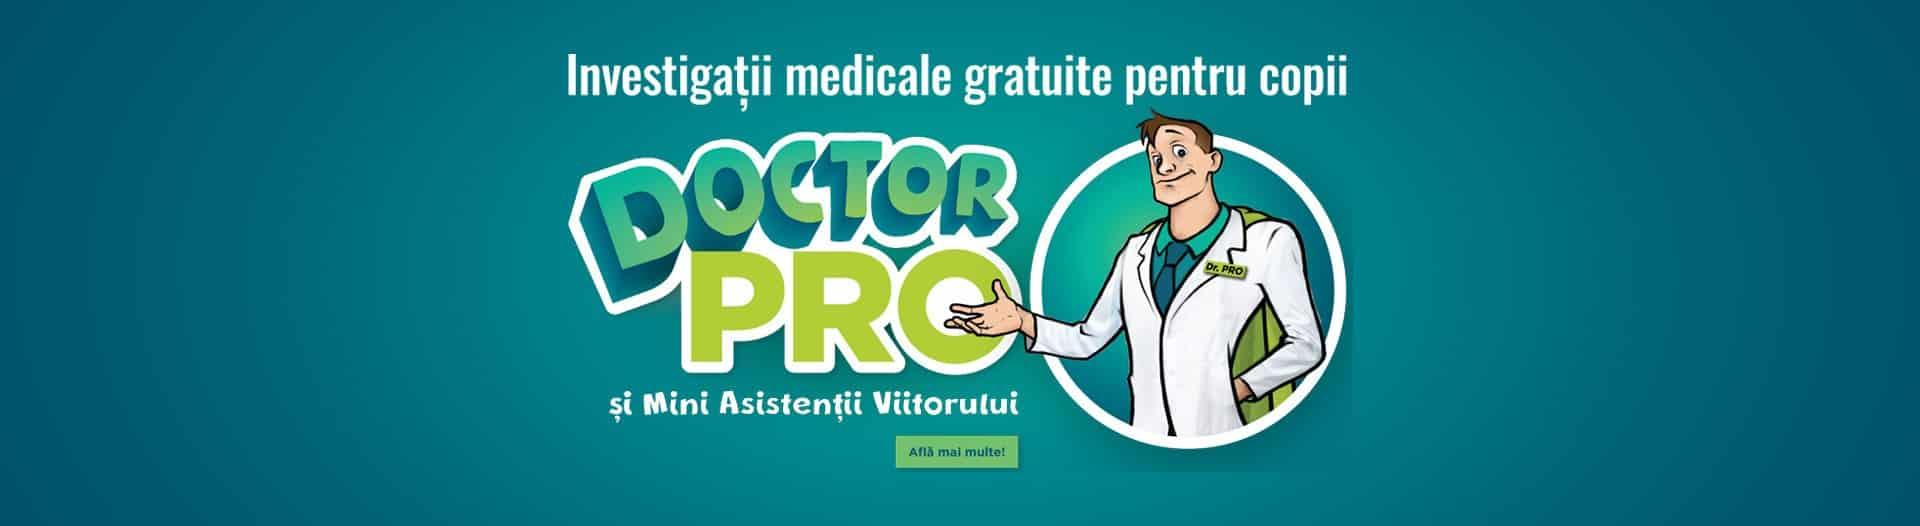 Investigații gratuite Pro Clinic